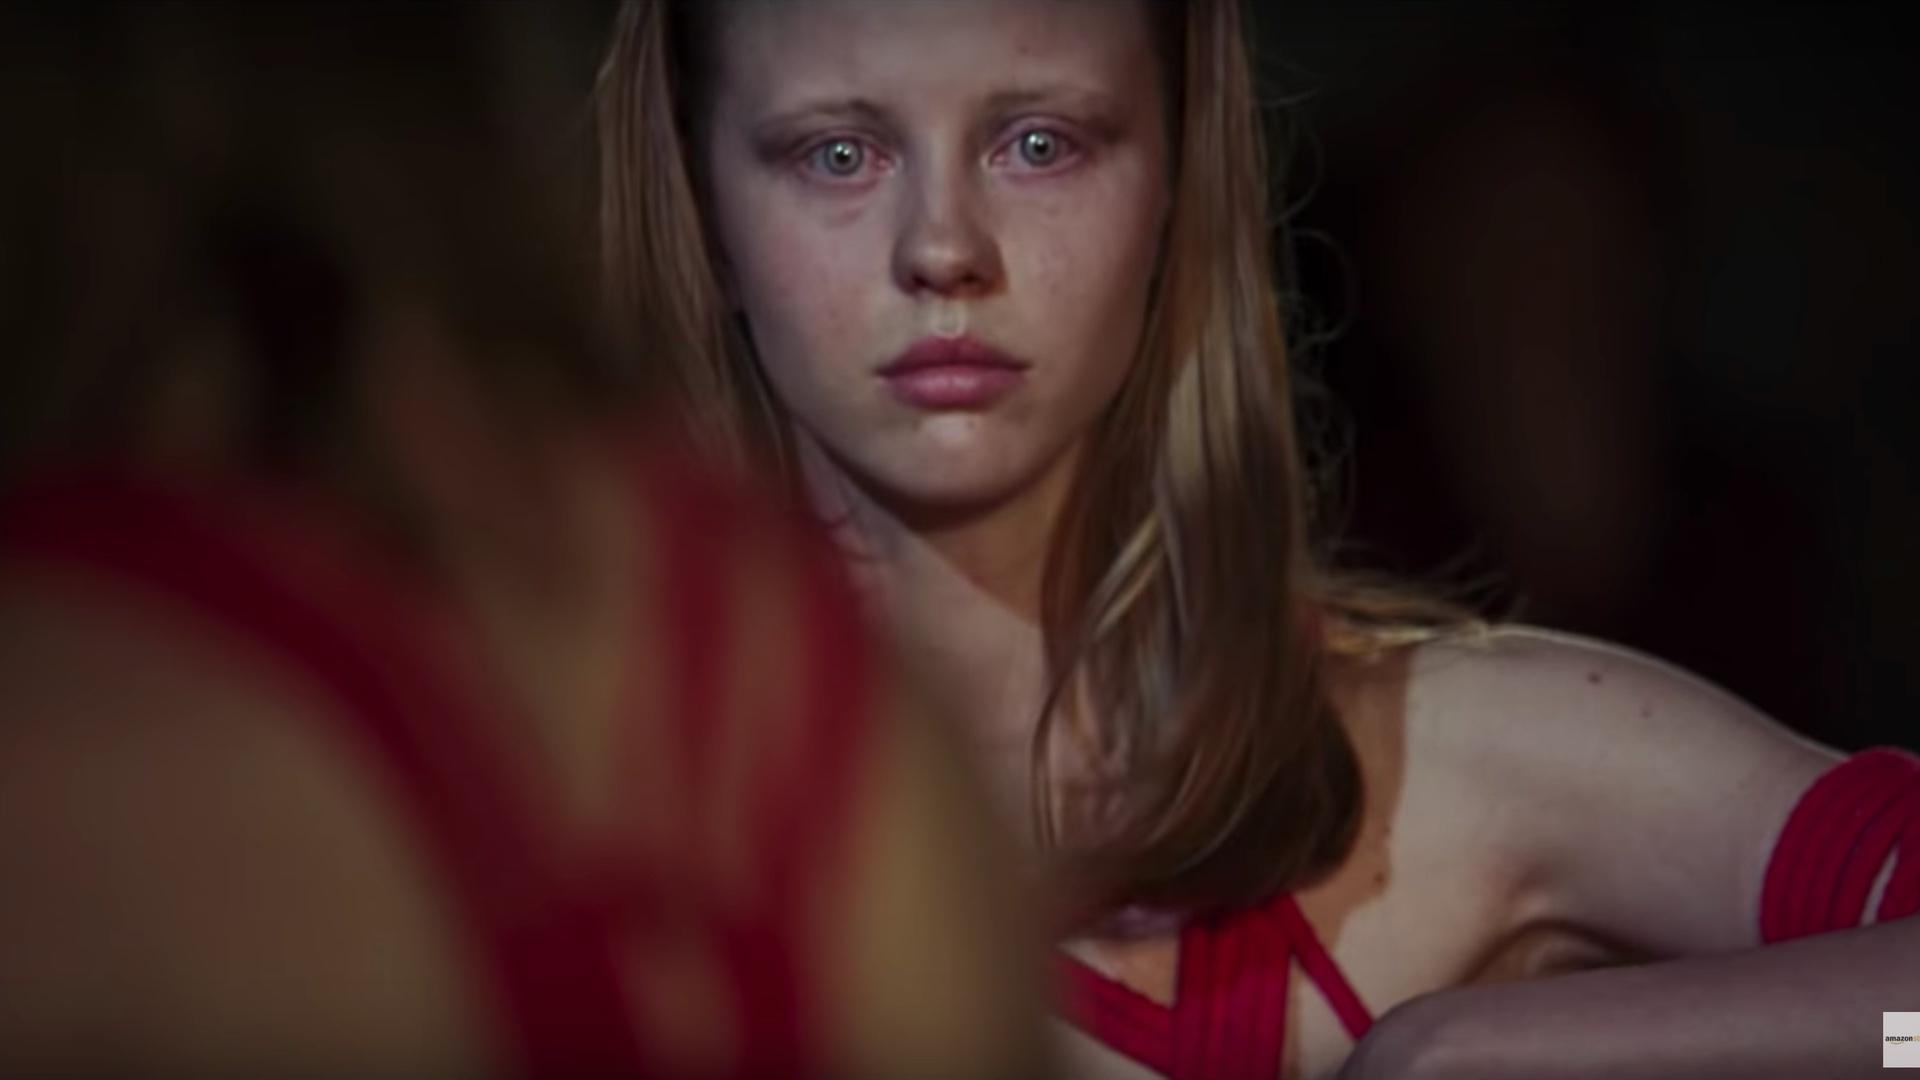 heres-the-nightmarish-first-teaser-trailer-for-the-suspiria-remake-social.jpg